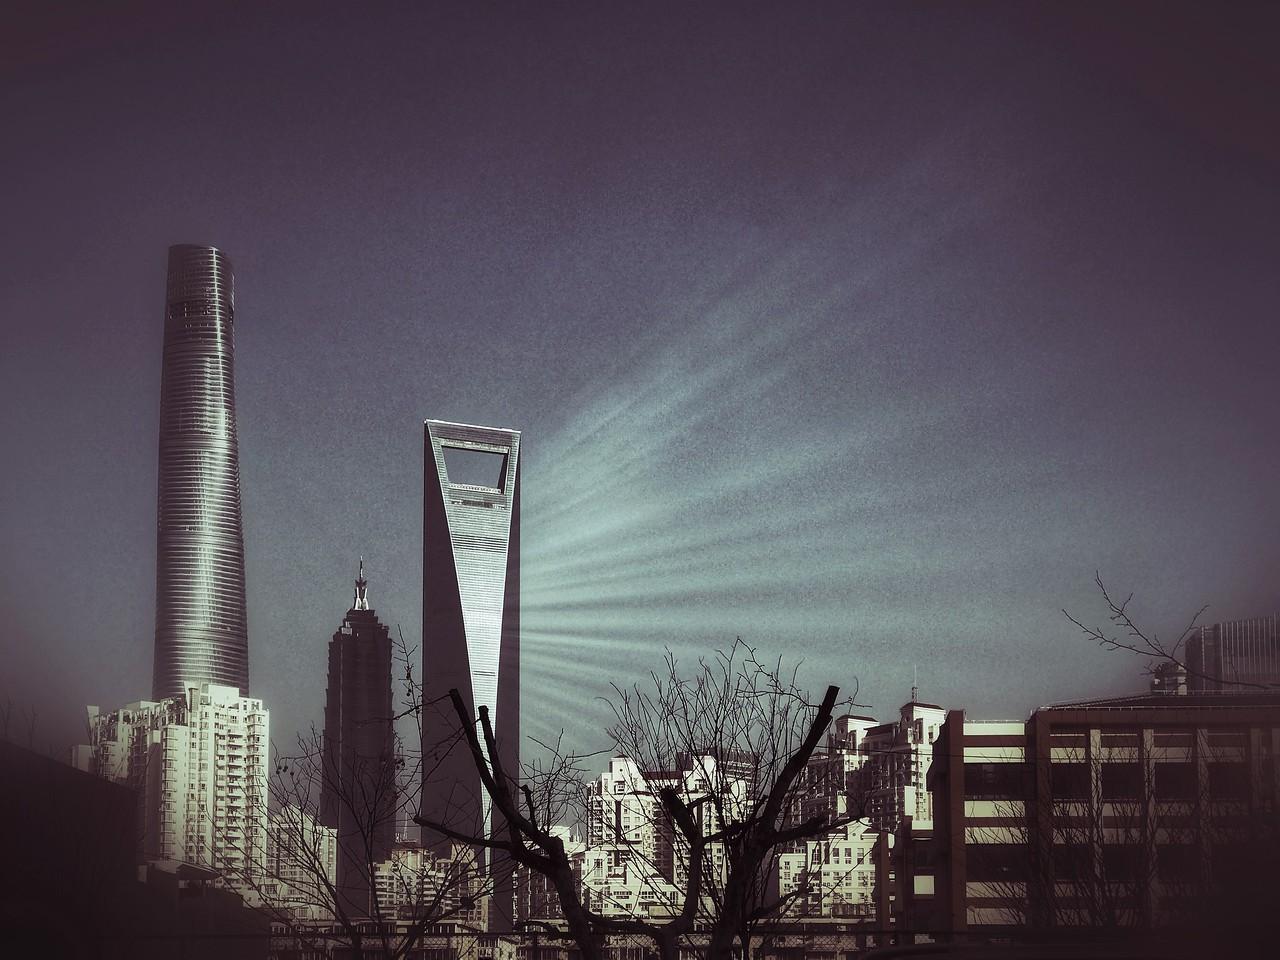 Tuesday Feb 27 - Beams of light